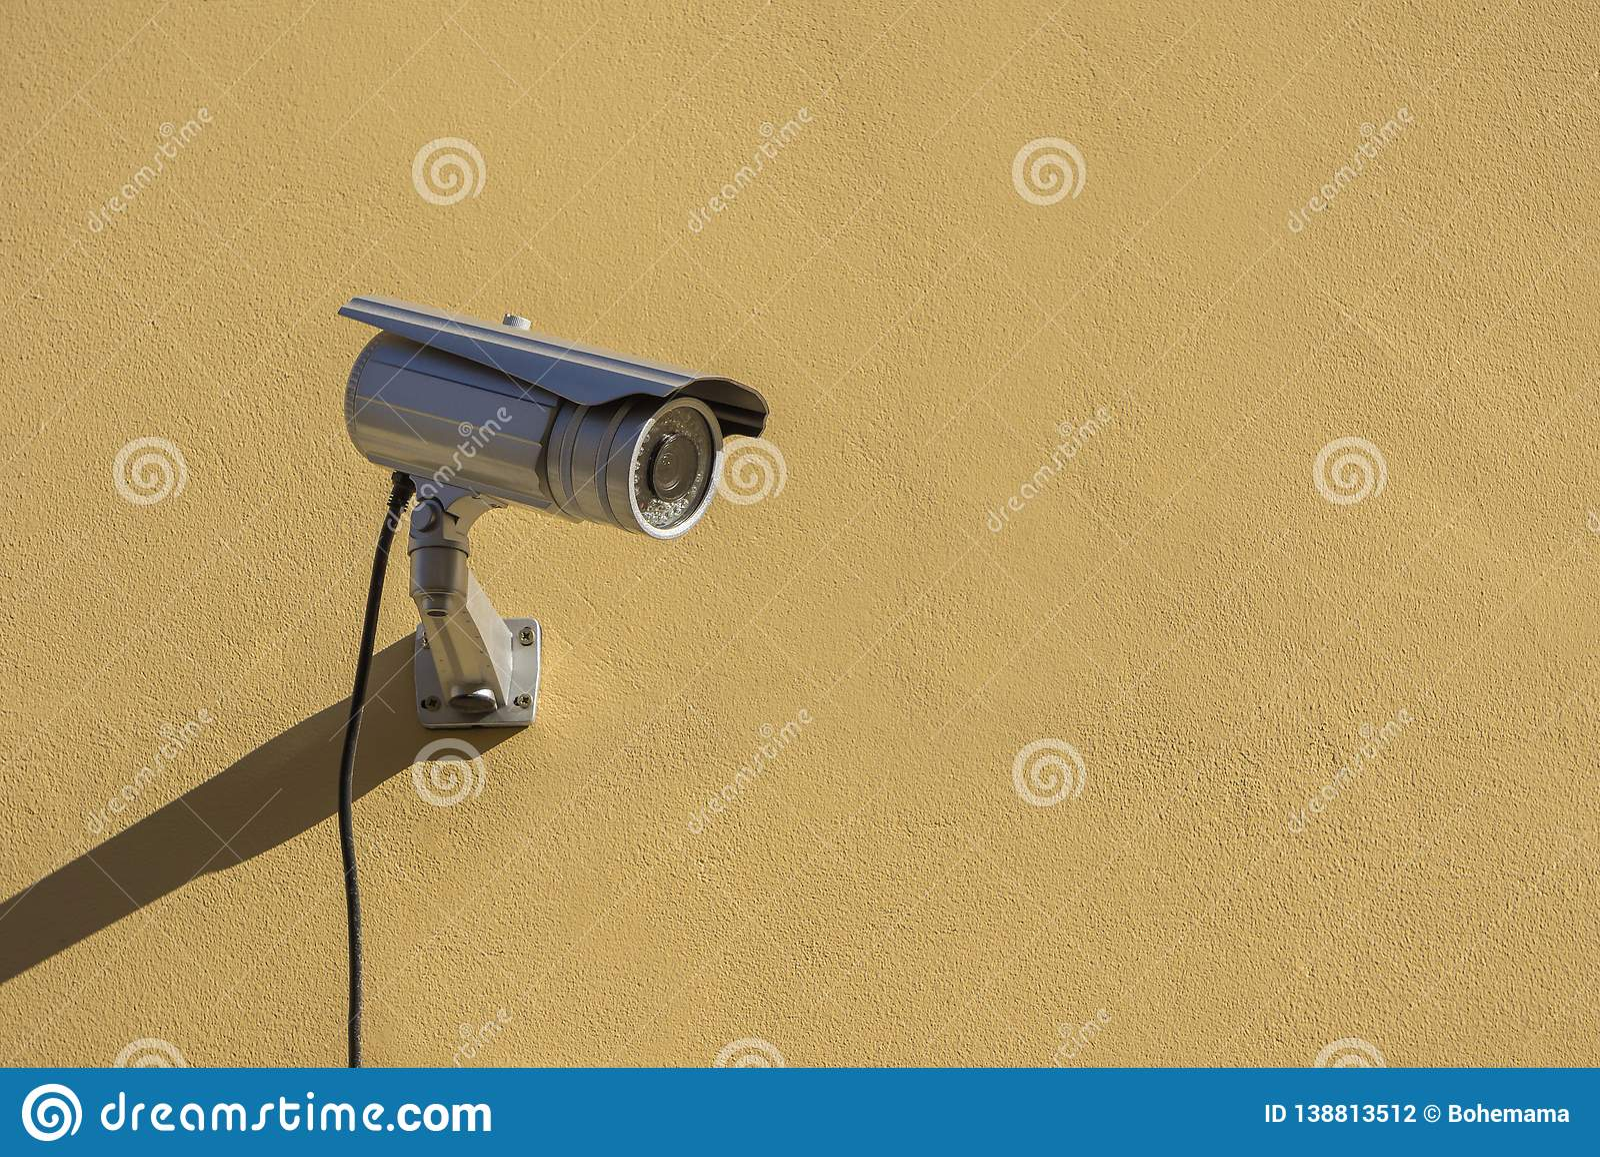 Modern CCTV camera on yellow building wall